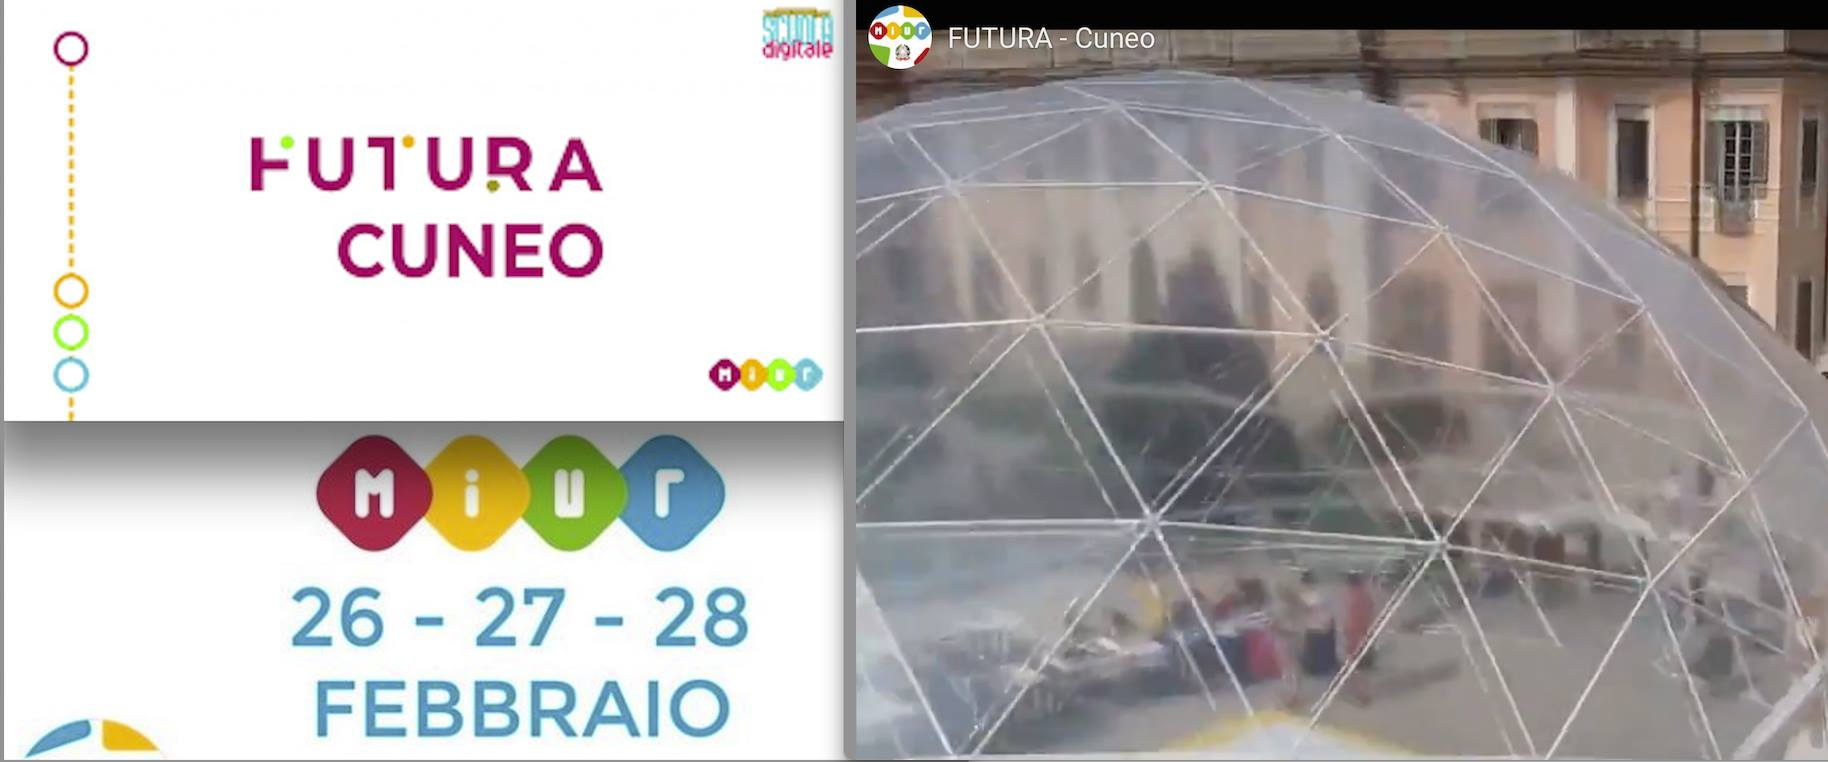 METS @FUTURA CUNEO FESTIVAL, 27 Febbraio 2019